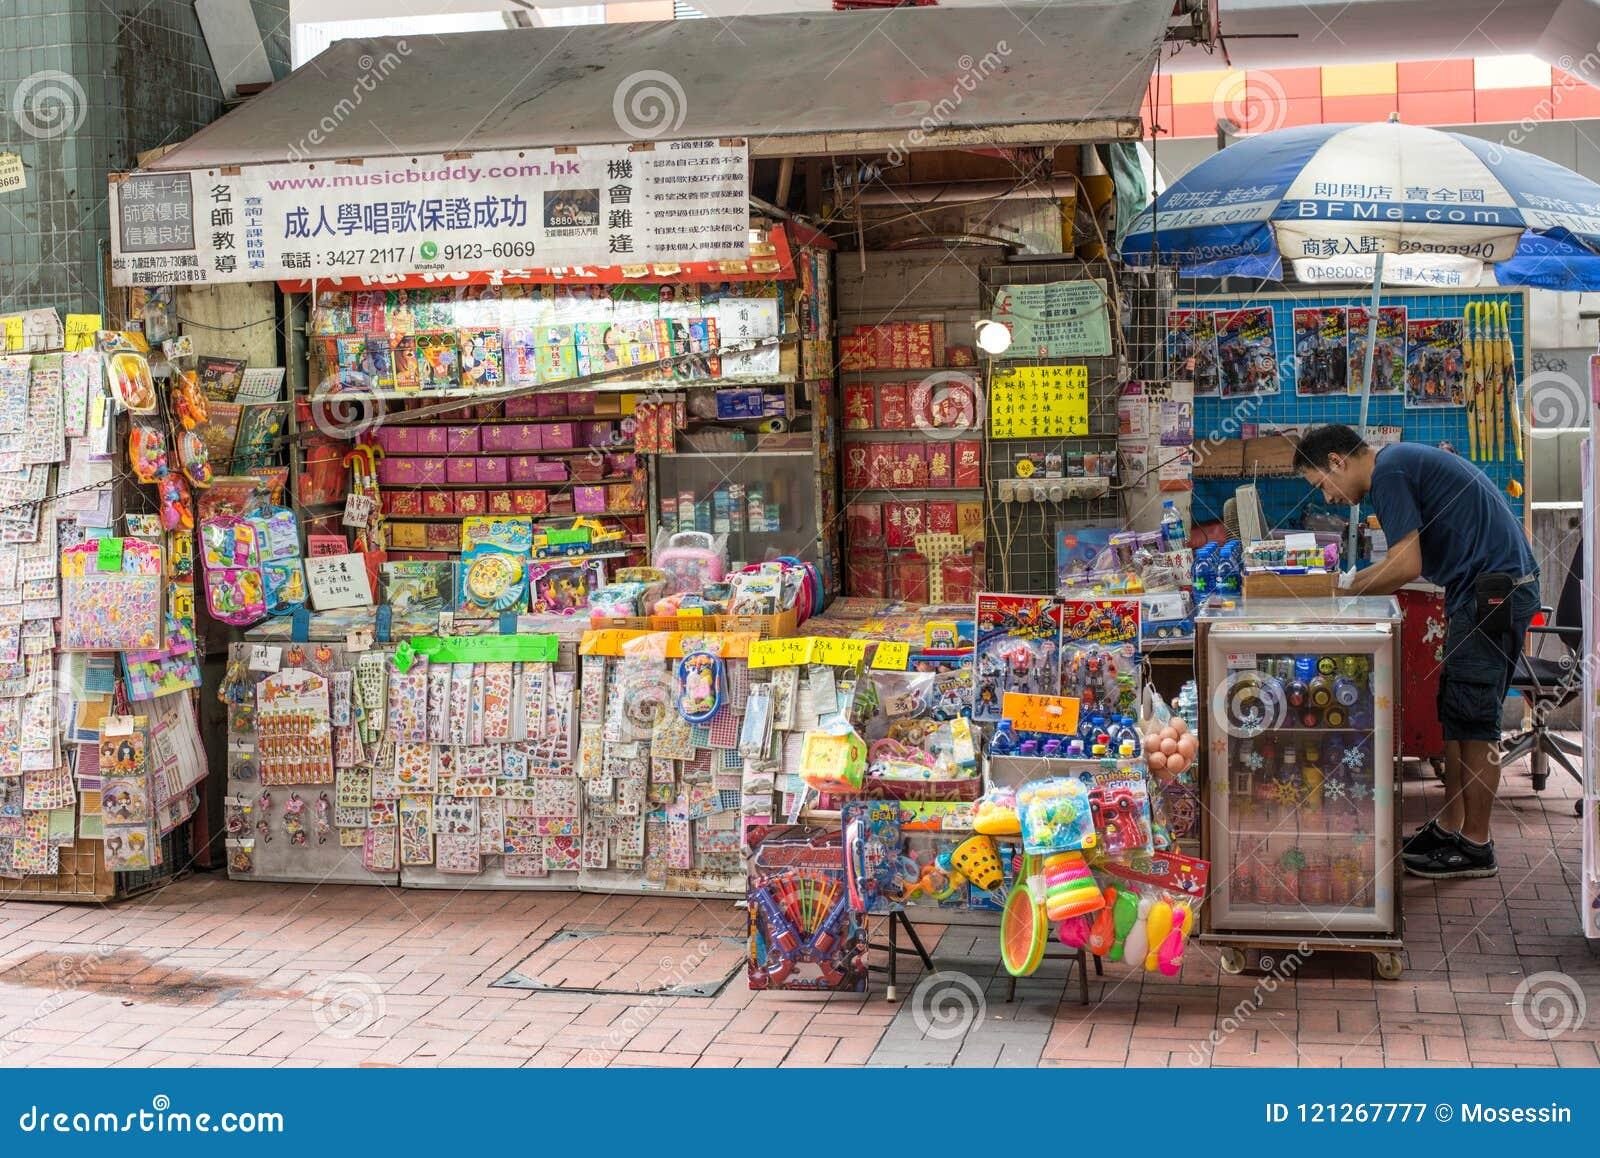 Hong Kong Sundry Booth Selling Market Editorial Photography